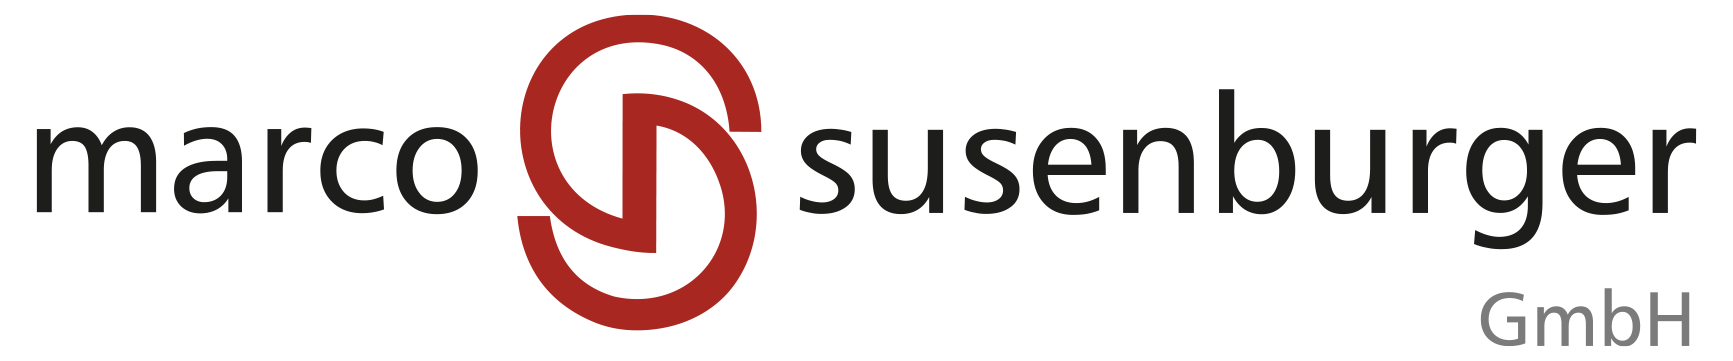 Marco Susenburger GmbH